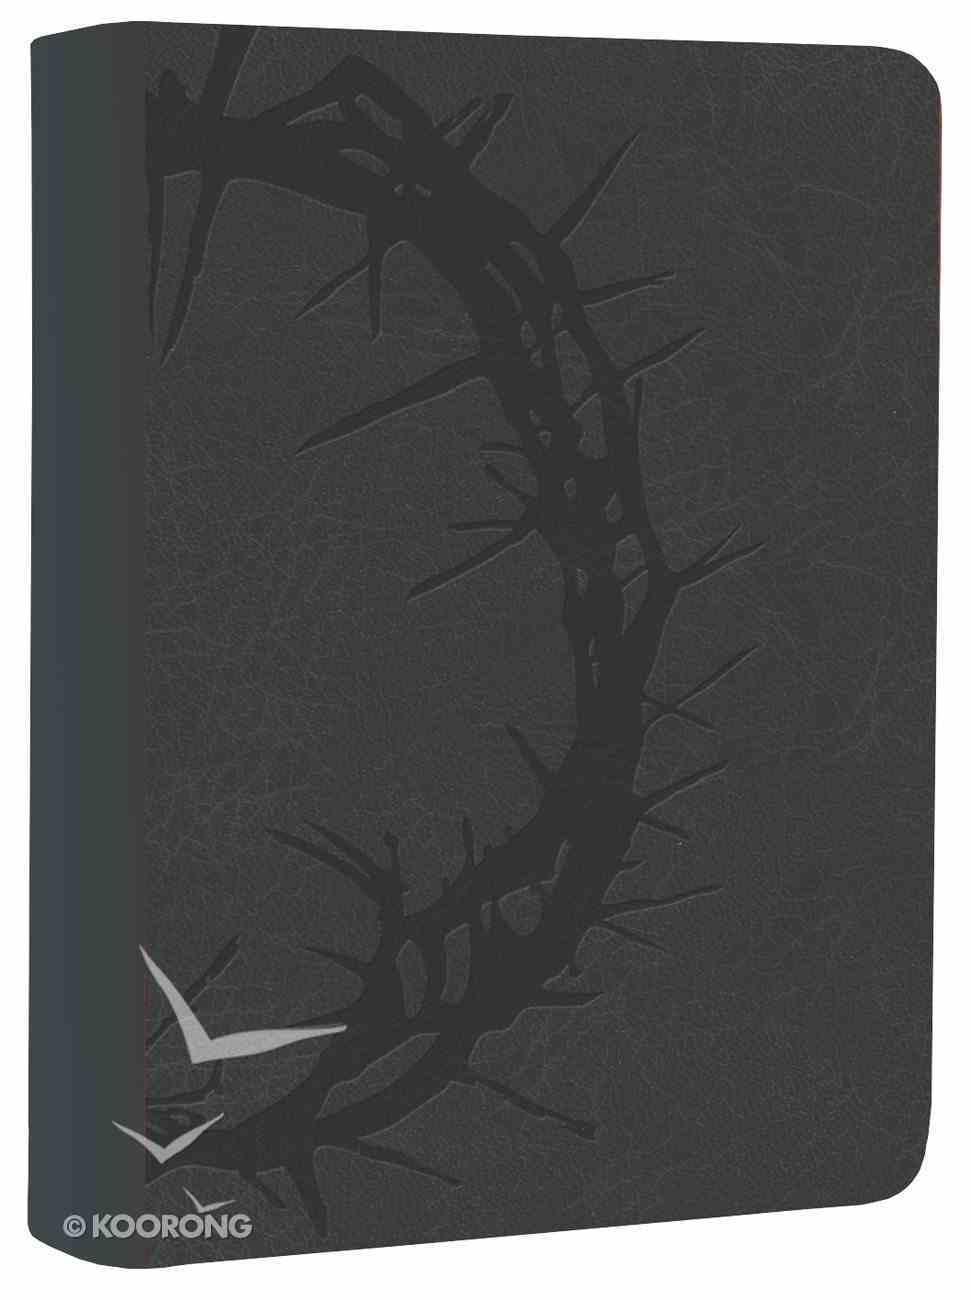 NKJV Large Print Compact Reference Bible Charcoal Premium Imitation Leather